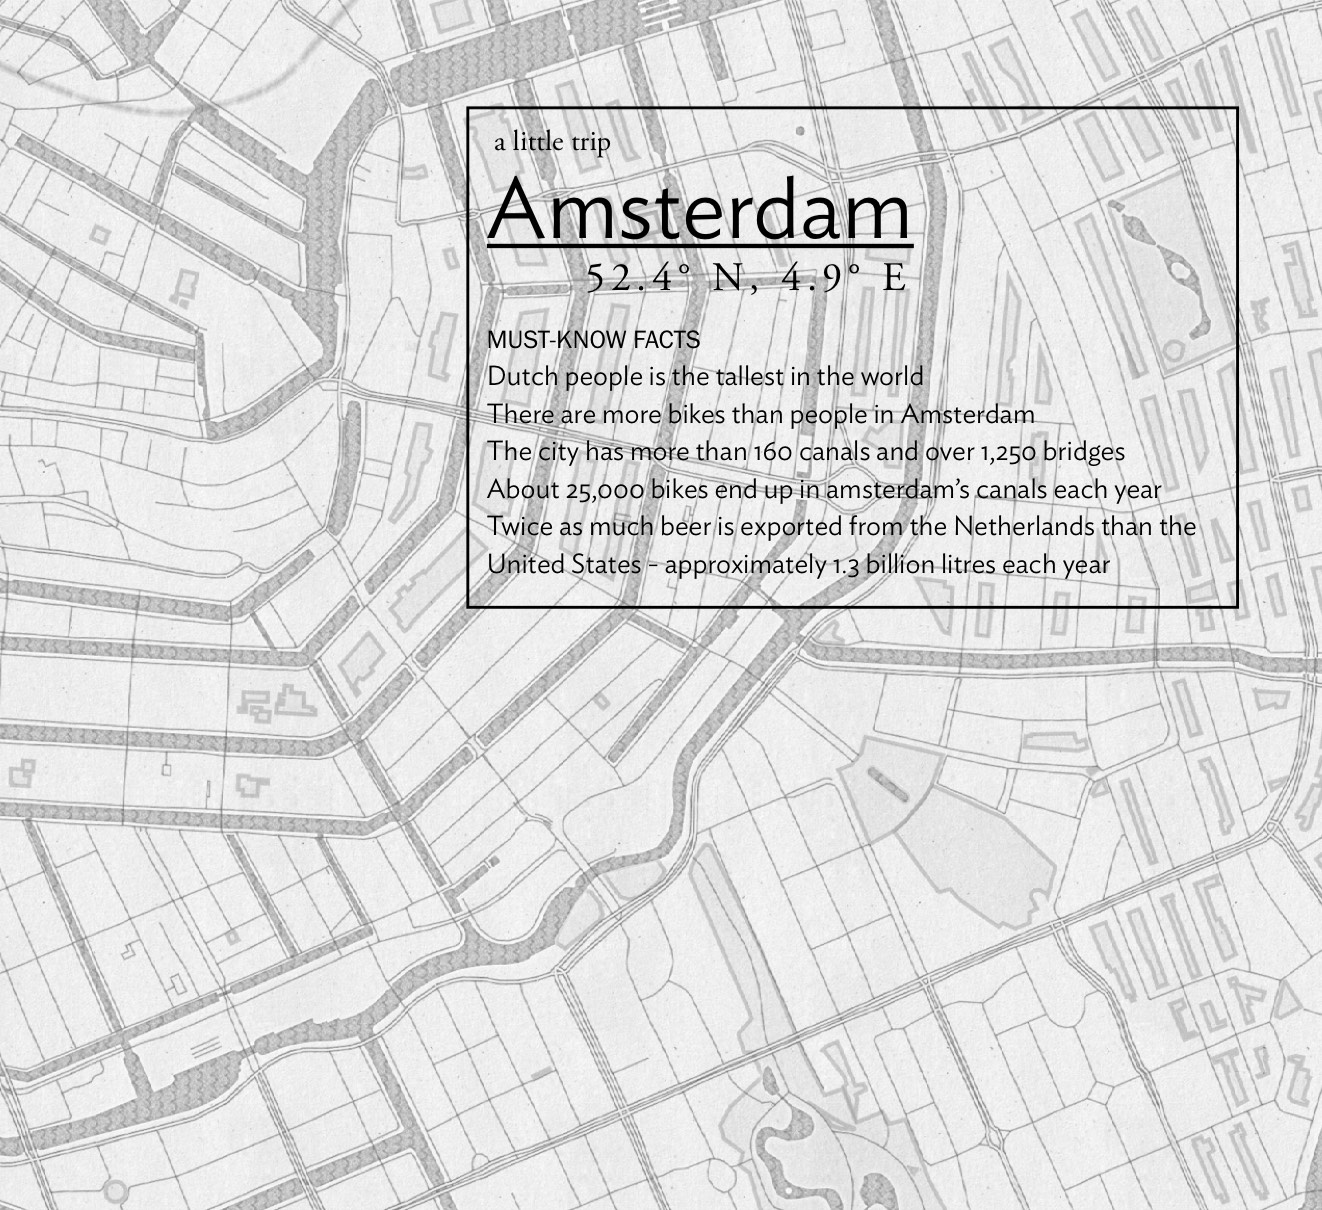 Amsterdam printable mini guide city guide hello getaway